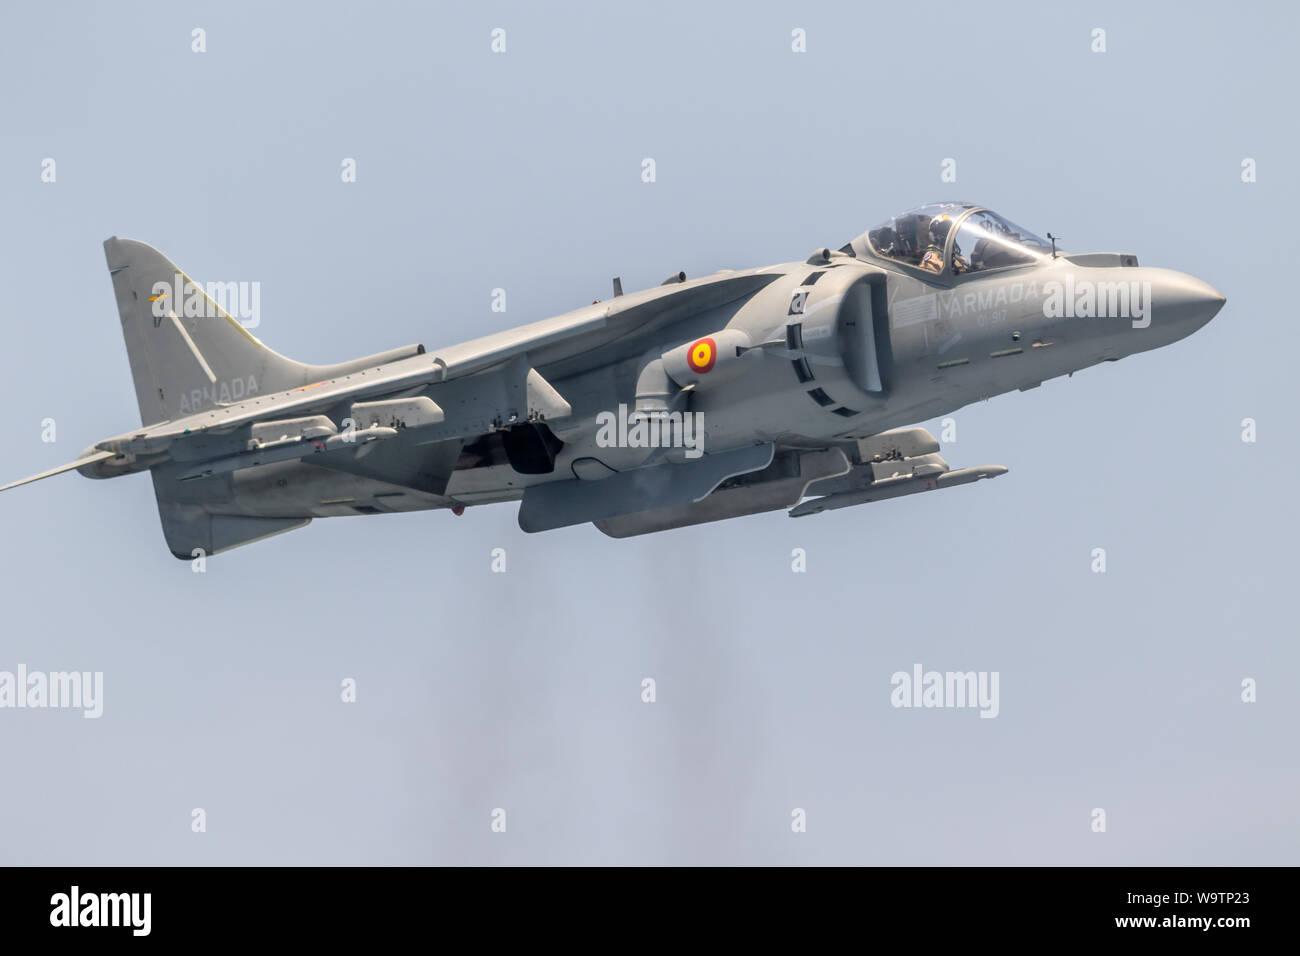 MOTRIL, GRANADA, SPAIN-JUN 11: Aircraft AV-8B Harrier Plus taking part in an exhibition on the 12th international airshow of Motril on Jun 11, 2017, i Stock Photo